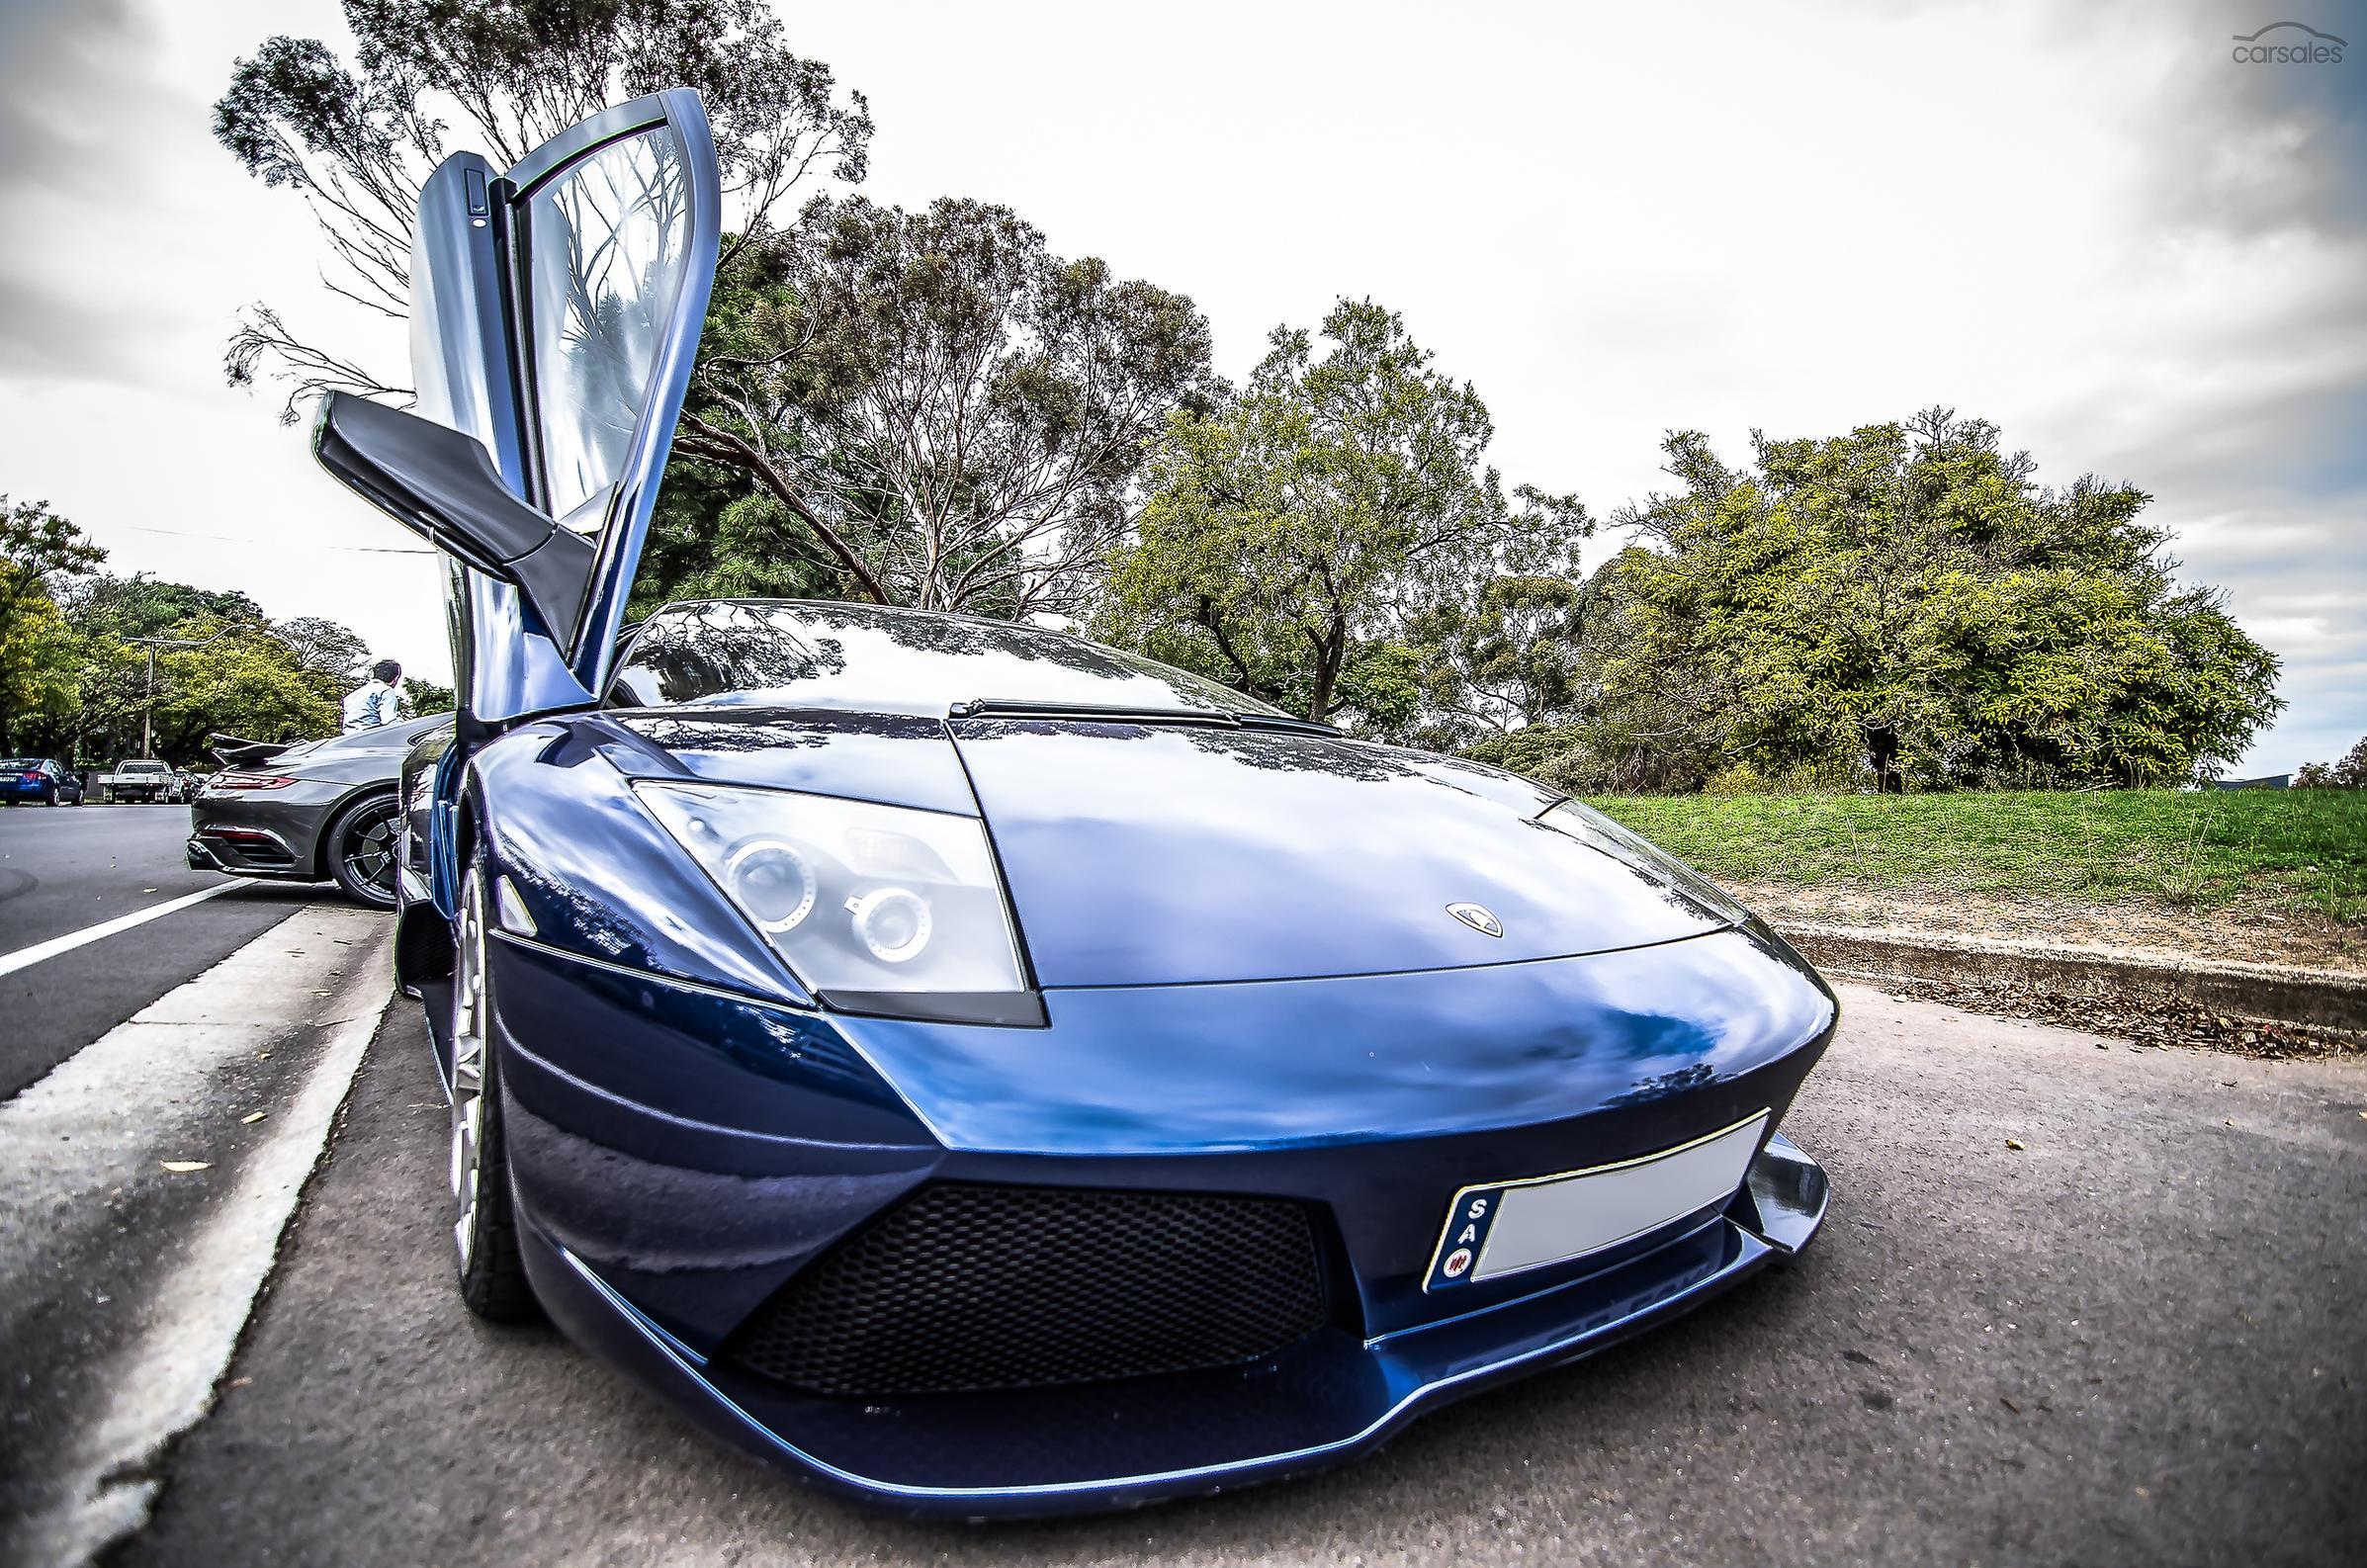 Used Lamborghini parts - For Diablo, Countach, Murcielago ...